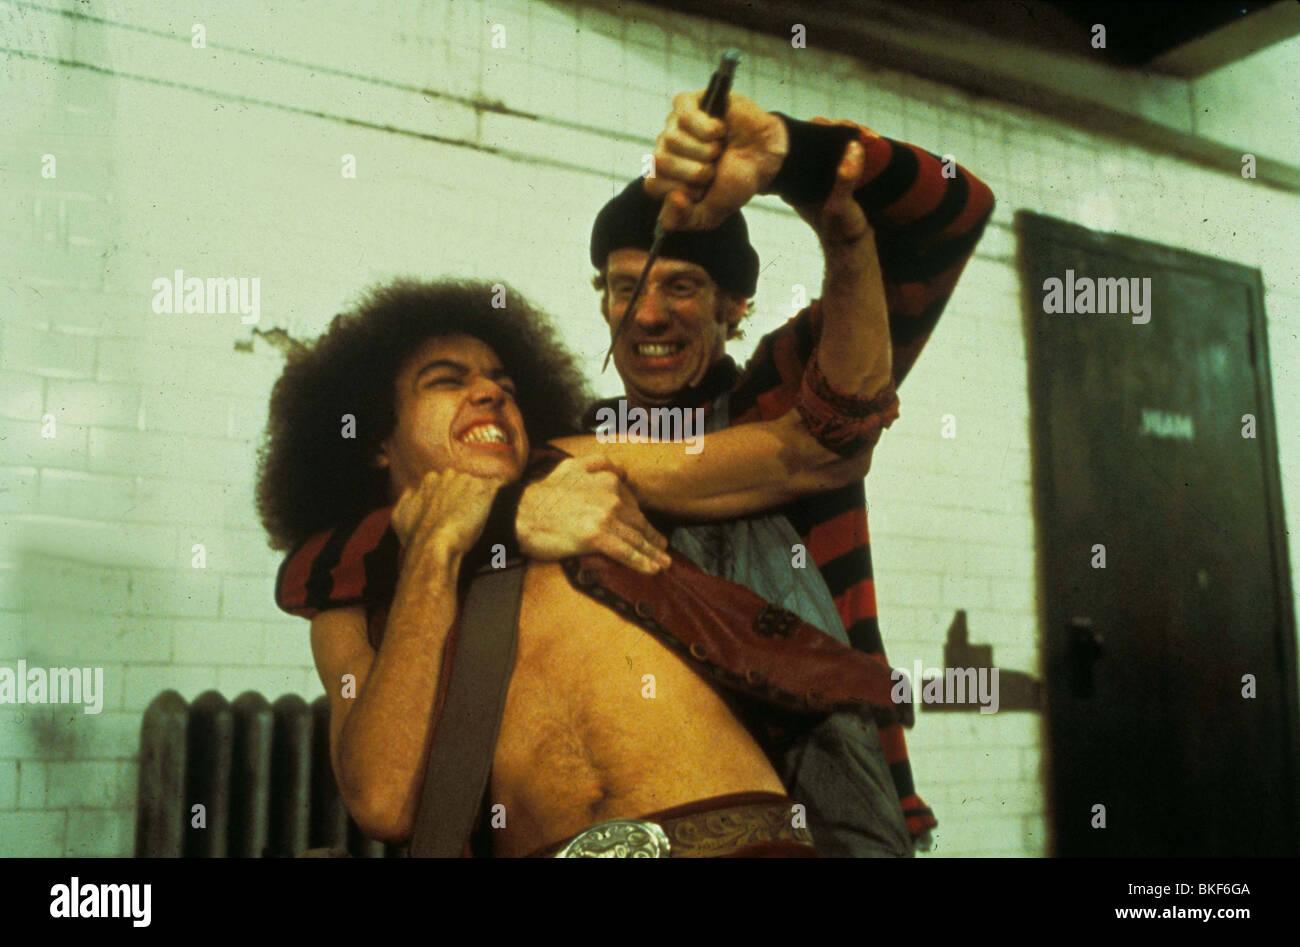 THE WARRIORS (1979) MARCELINO SANCHEZ WARS 004 L - Stock Image